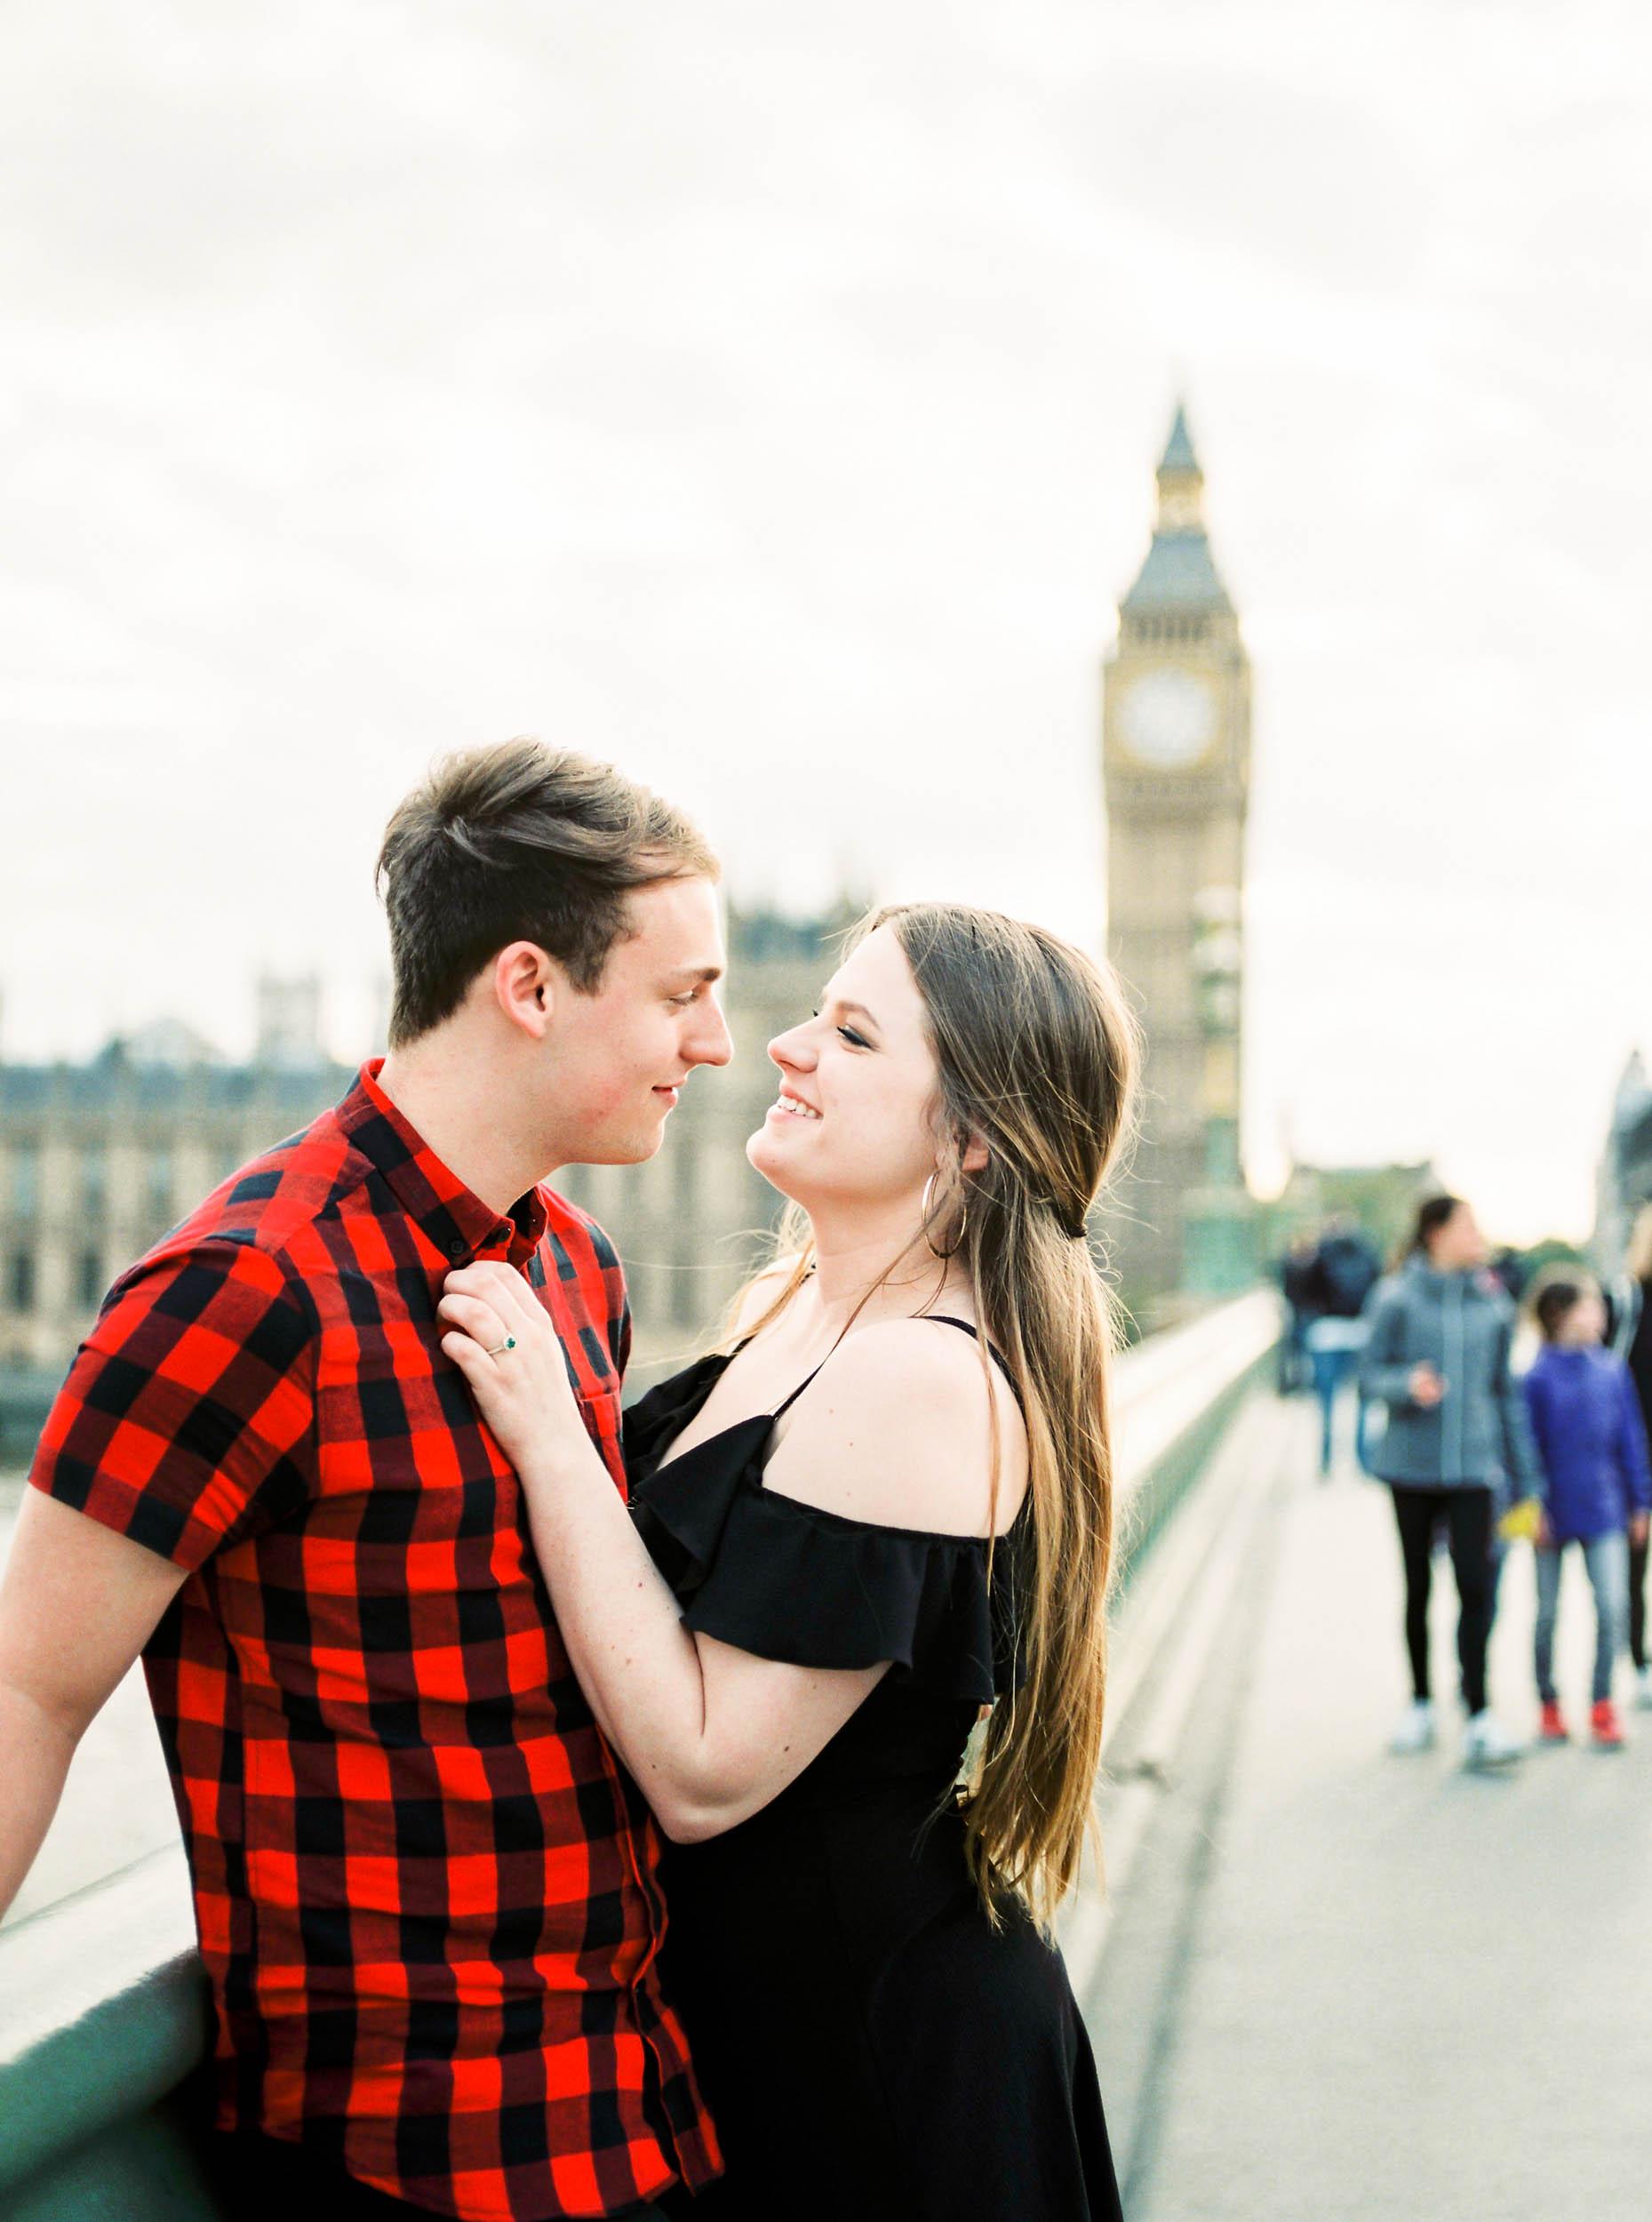 Amy O'Boyle Photography- Destination & UK Fine Art Film Wedding Photographer- London Proposal- Westminster Bridge Big Ben Engagement Shoot-4.jpg